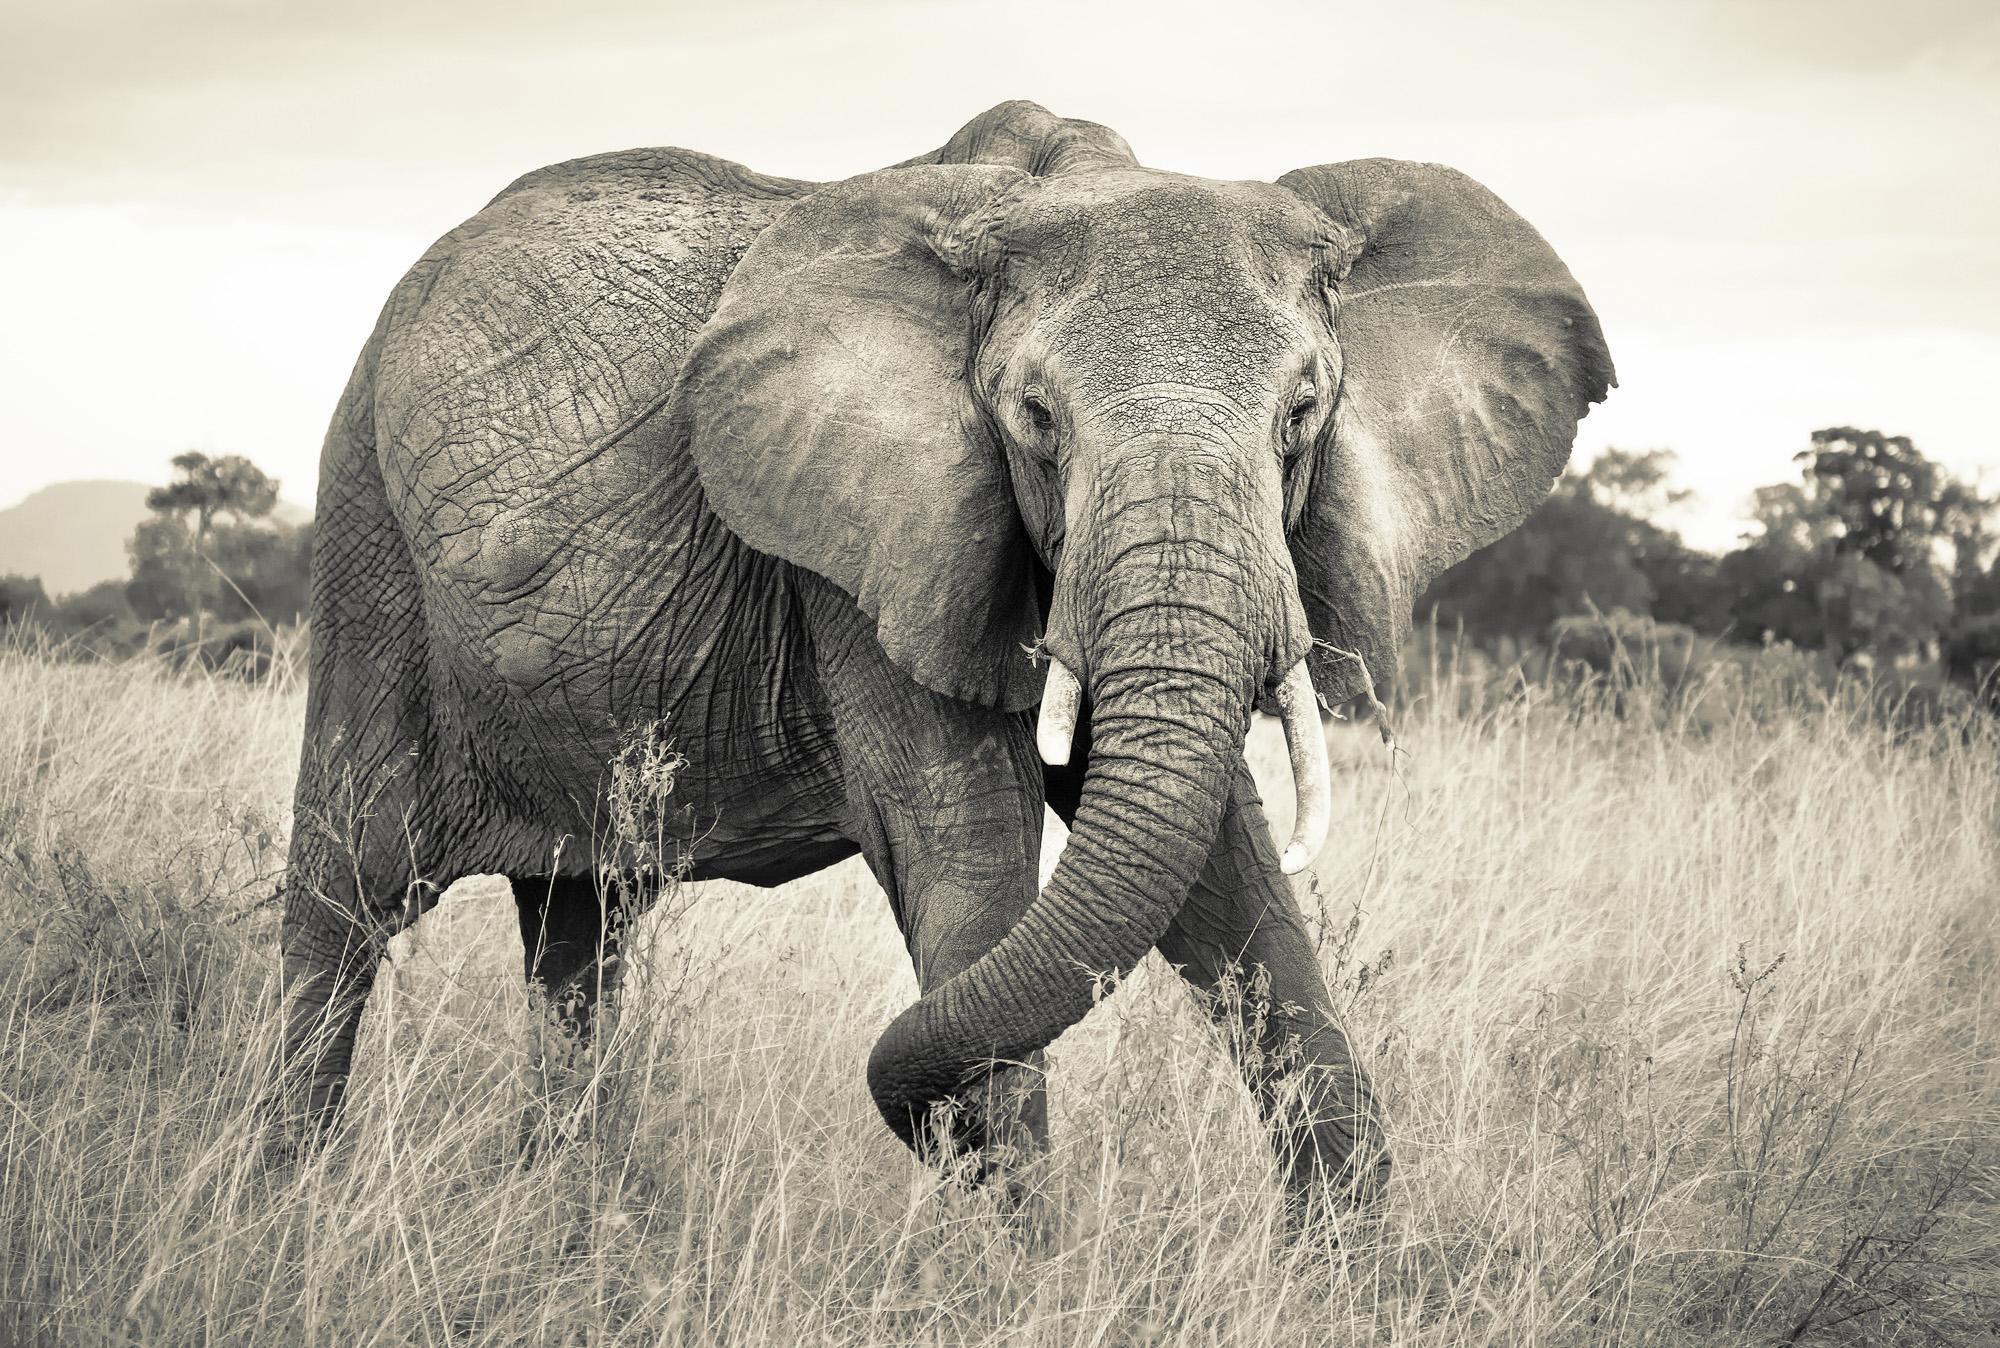 "Fototapeten National Geographic : Fototapeten g?nstig kaufen, z.B.: Fototapete ""Elephant"" von National"